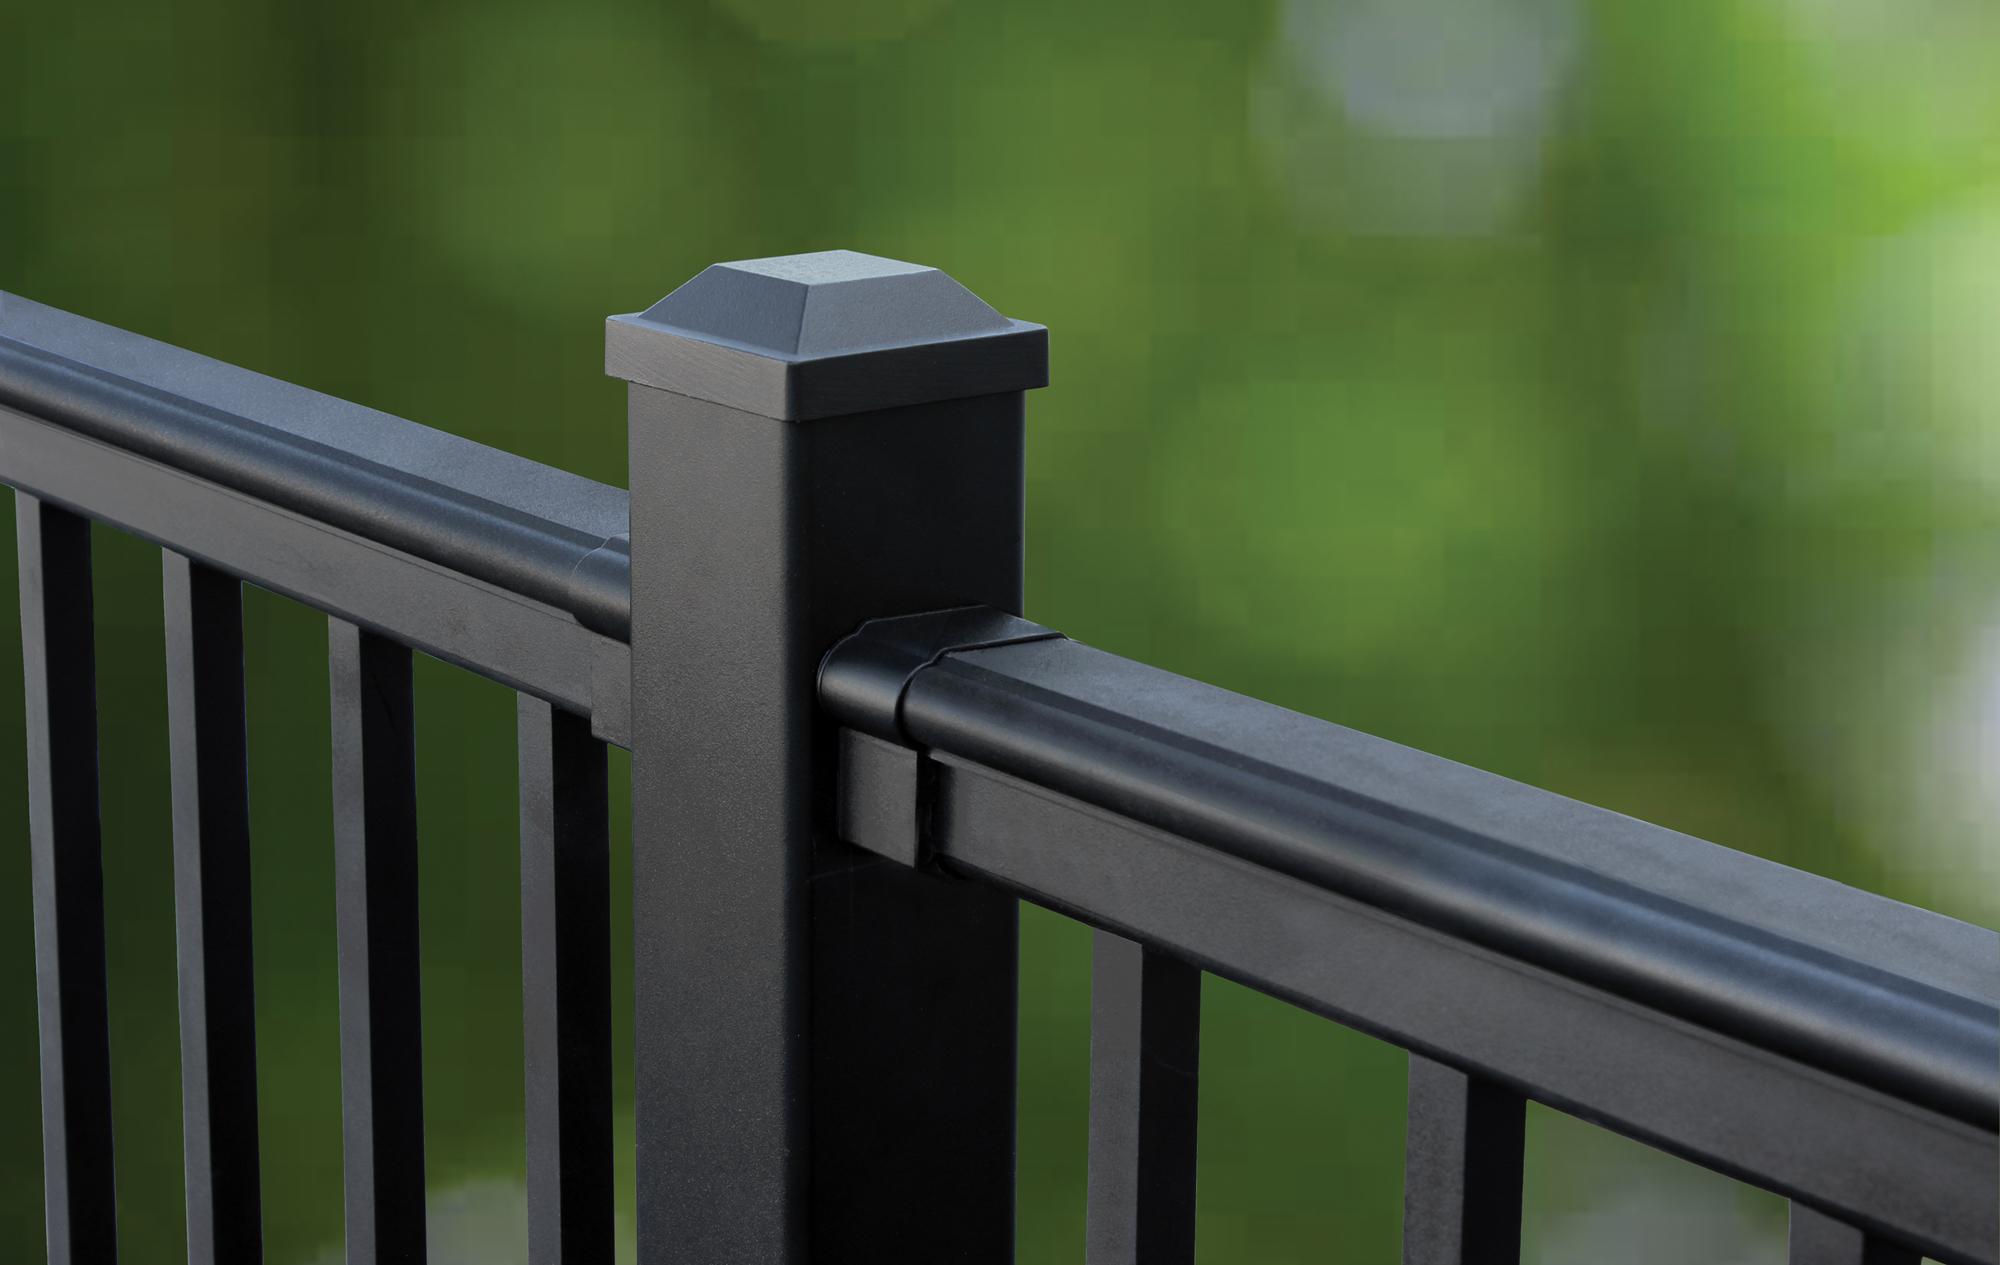 Easy Installation With Fairway S Slimline Railing Jlc